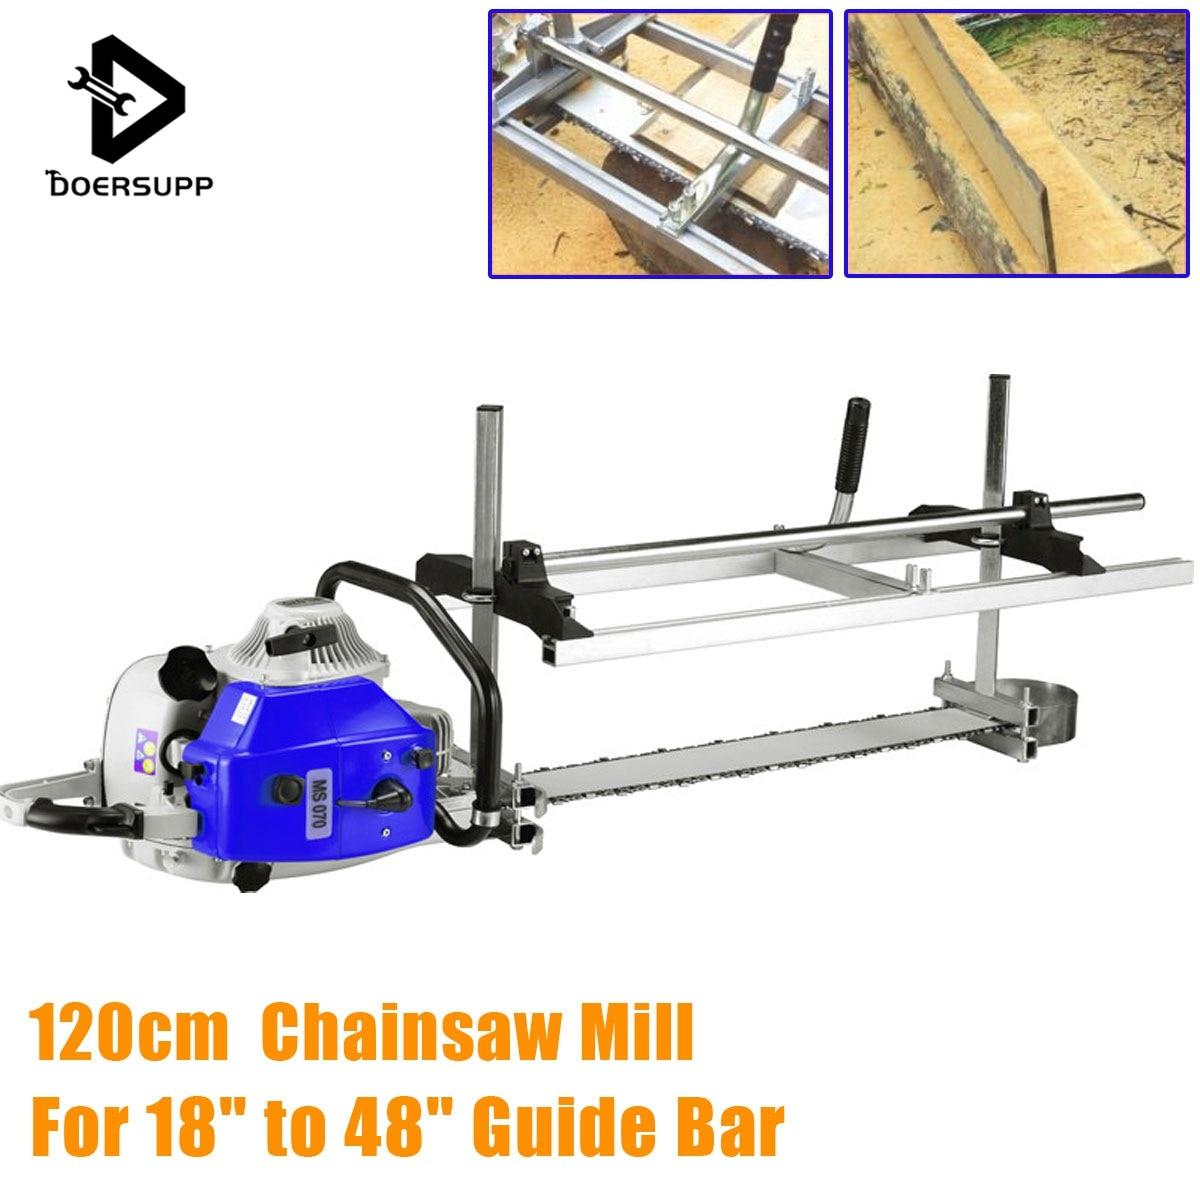 Doersupp 120 cm Portatile Chainsaw Mill Planking Fresatura Da 14